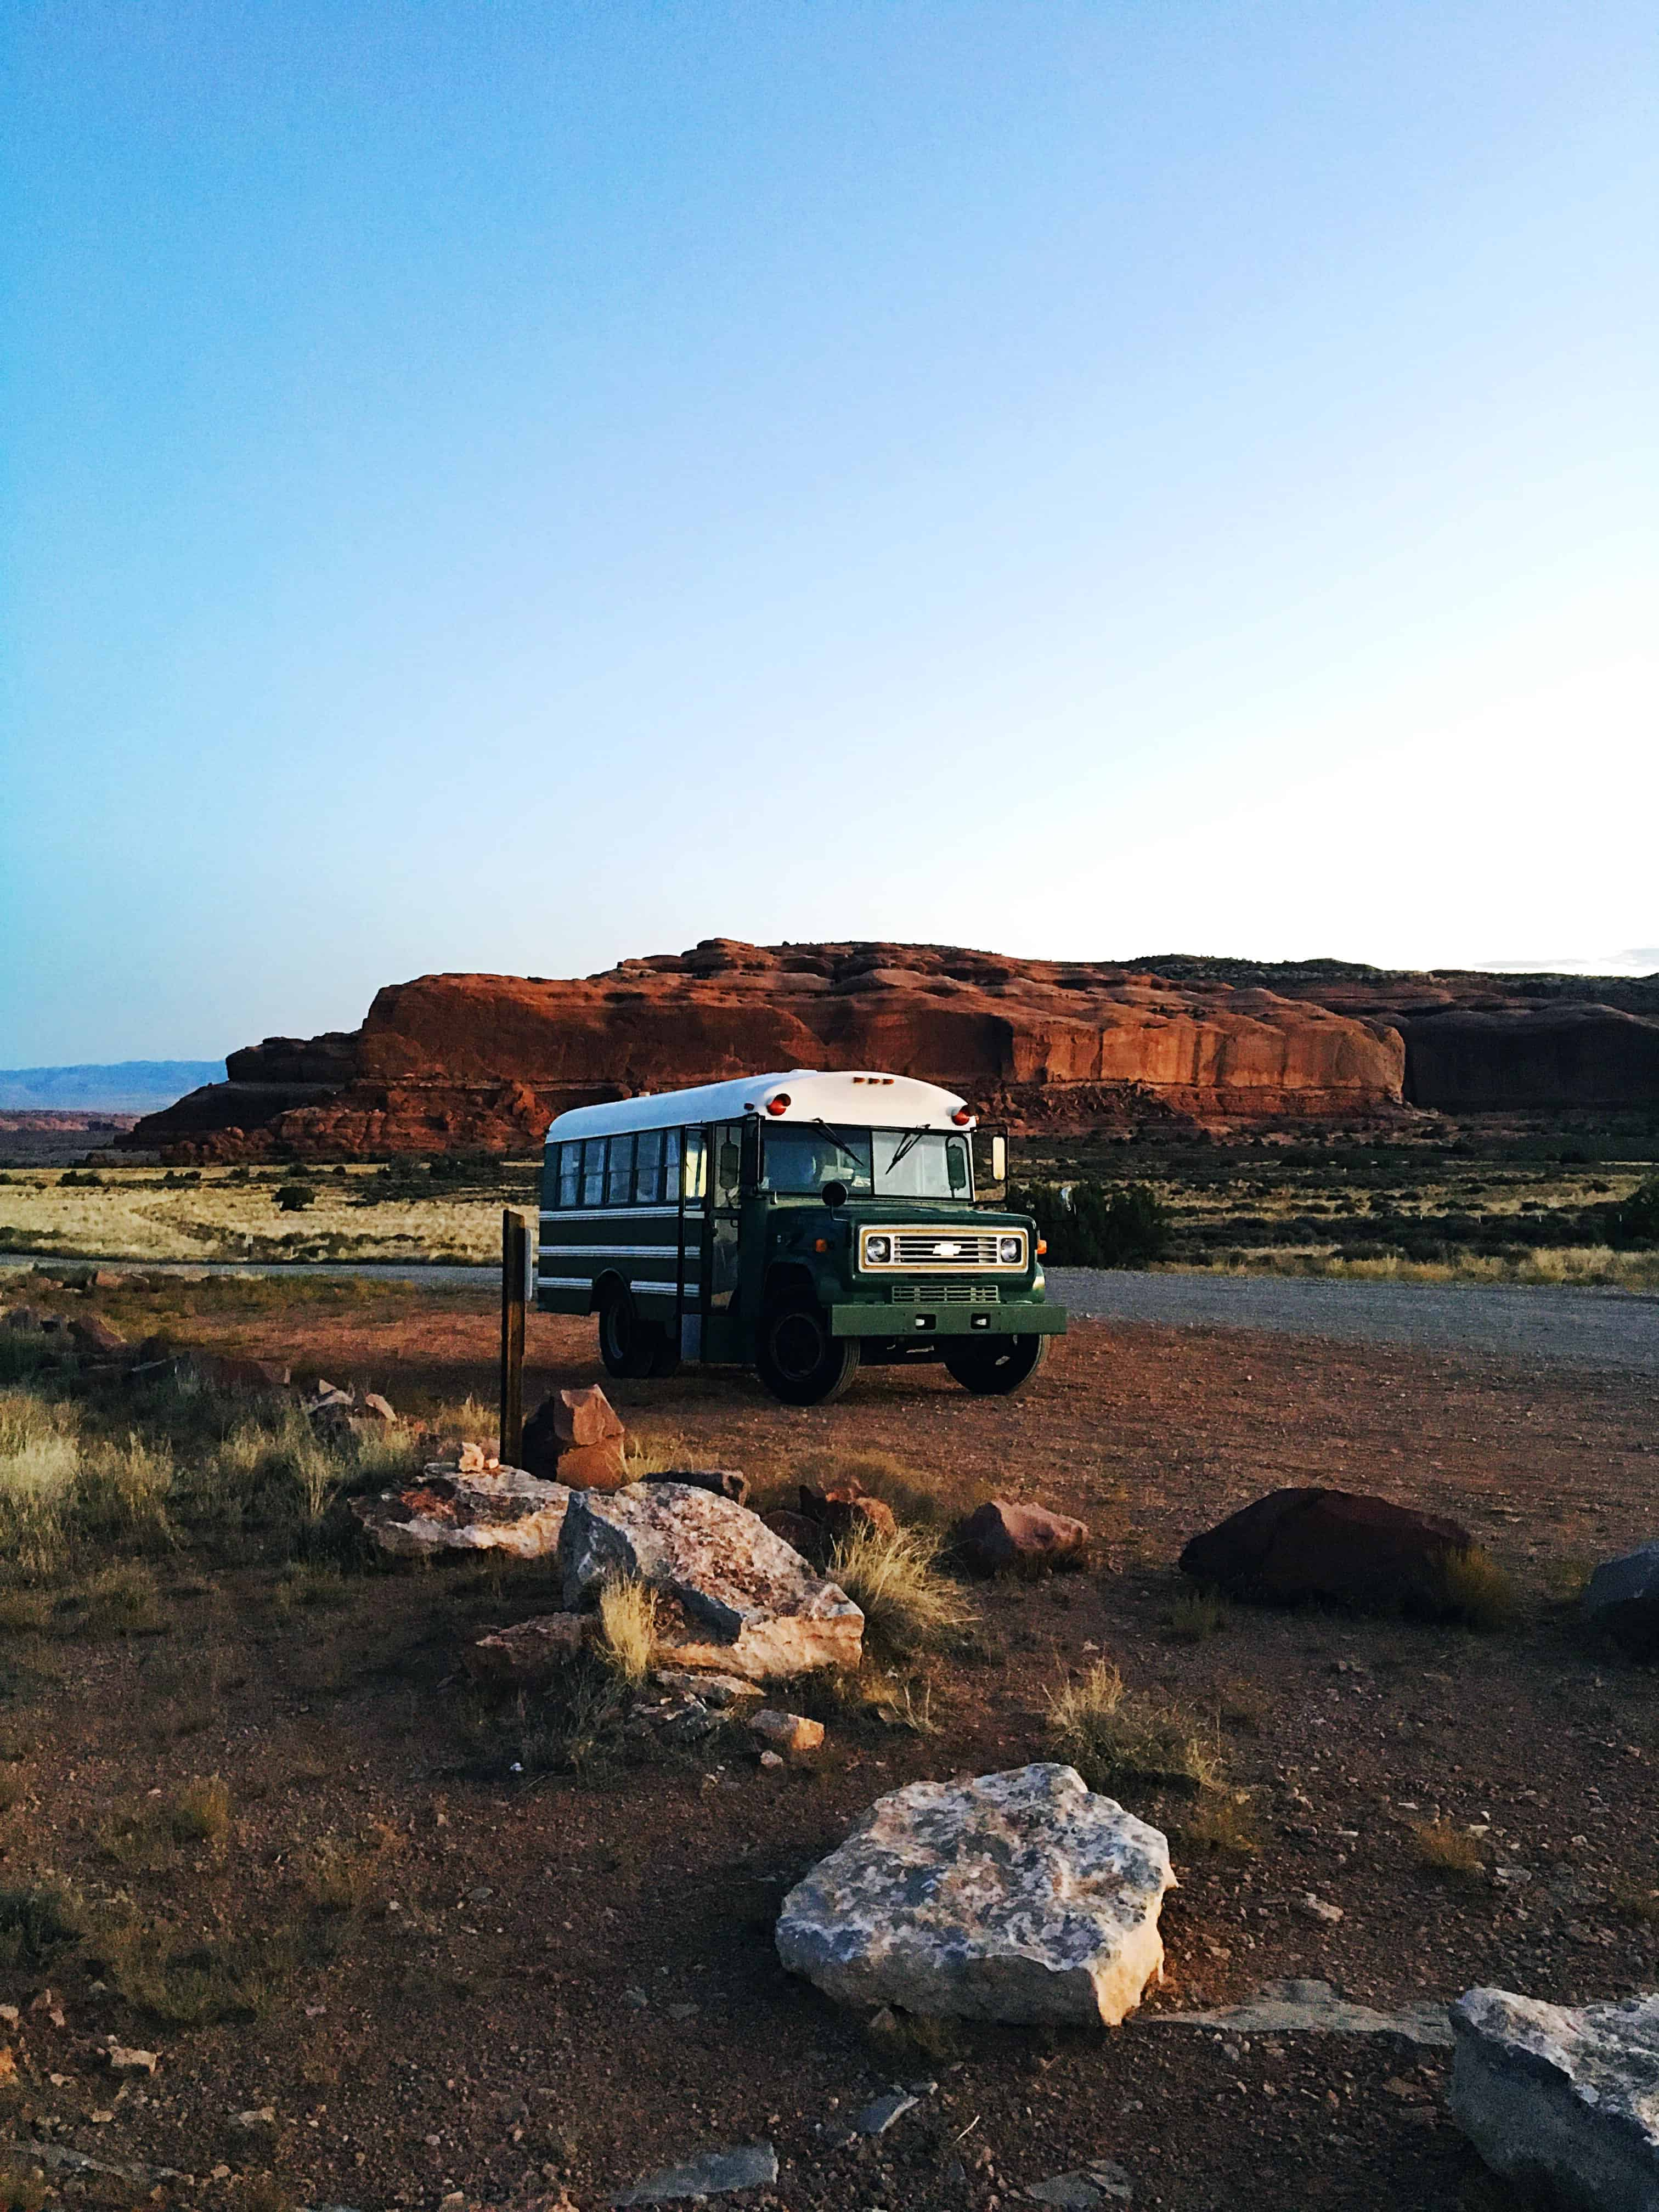 Diaries of Henrietta, the Bus (pt. II)